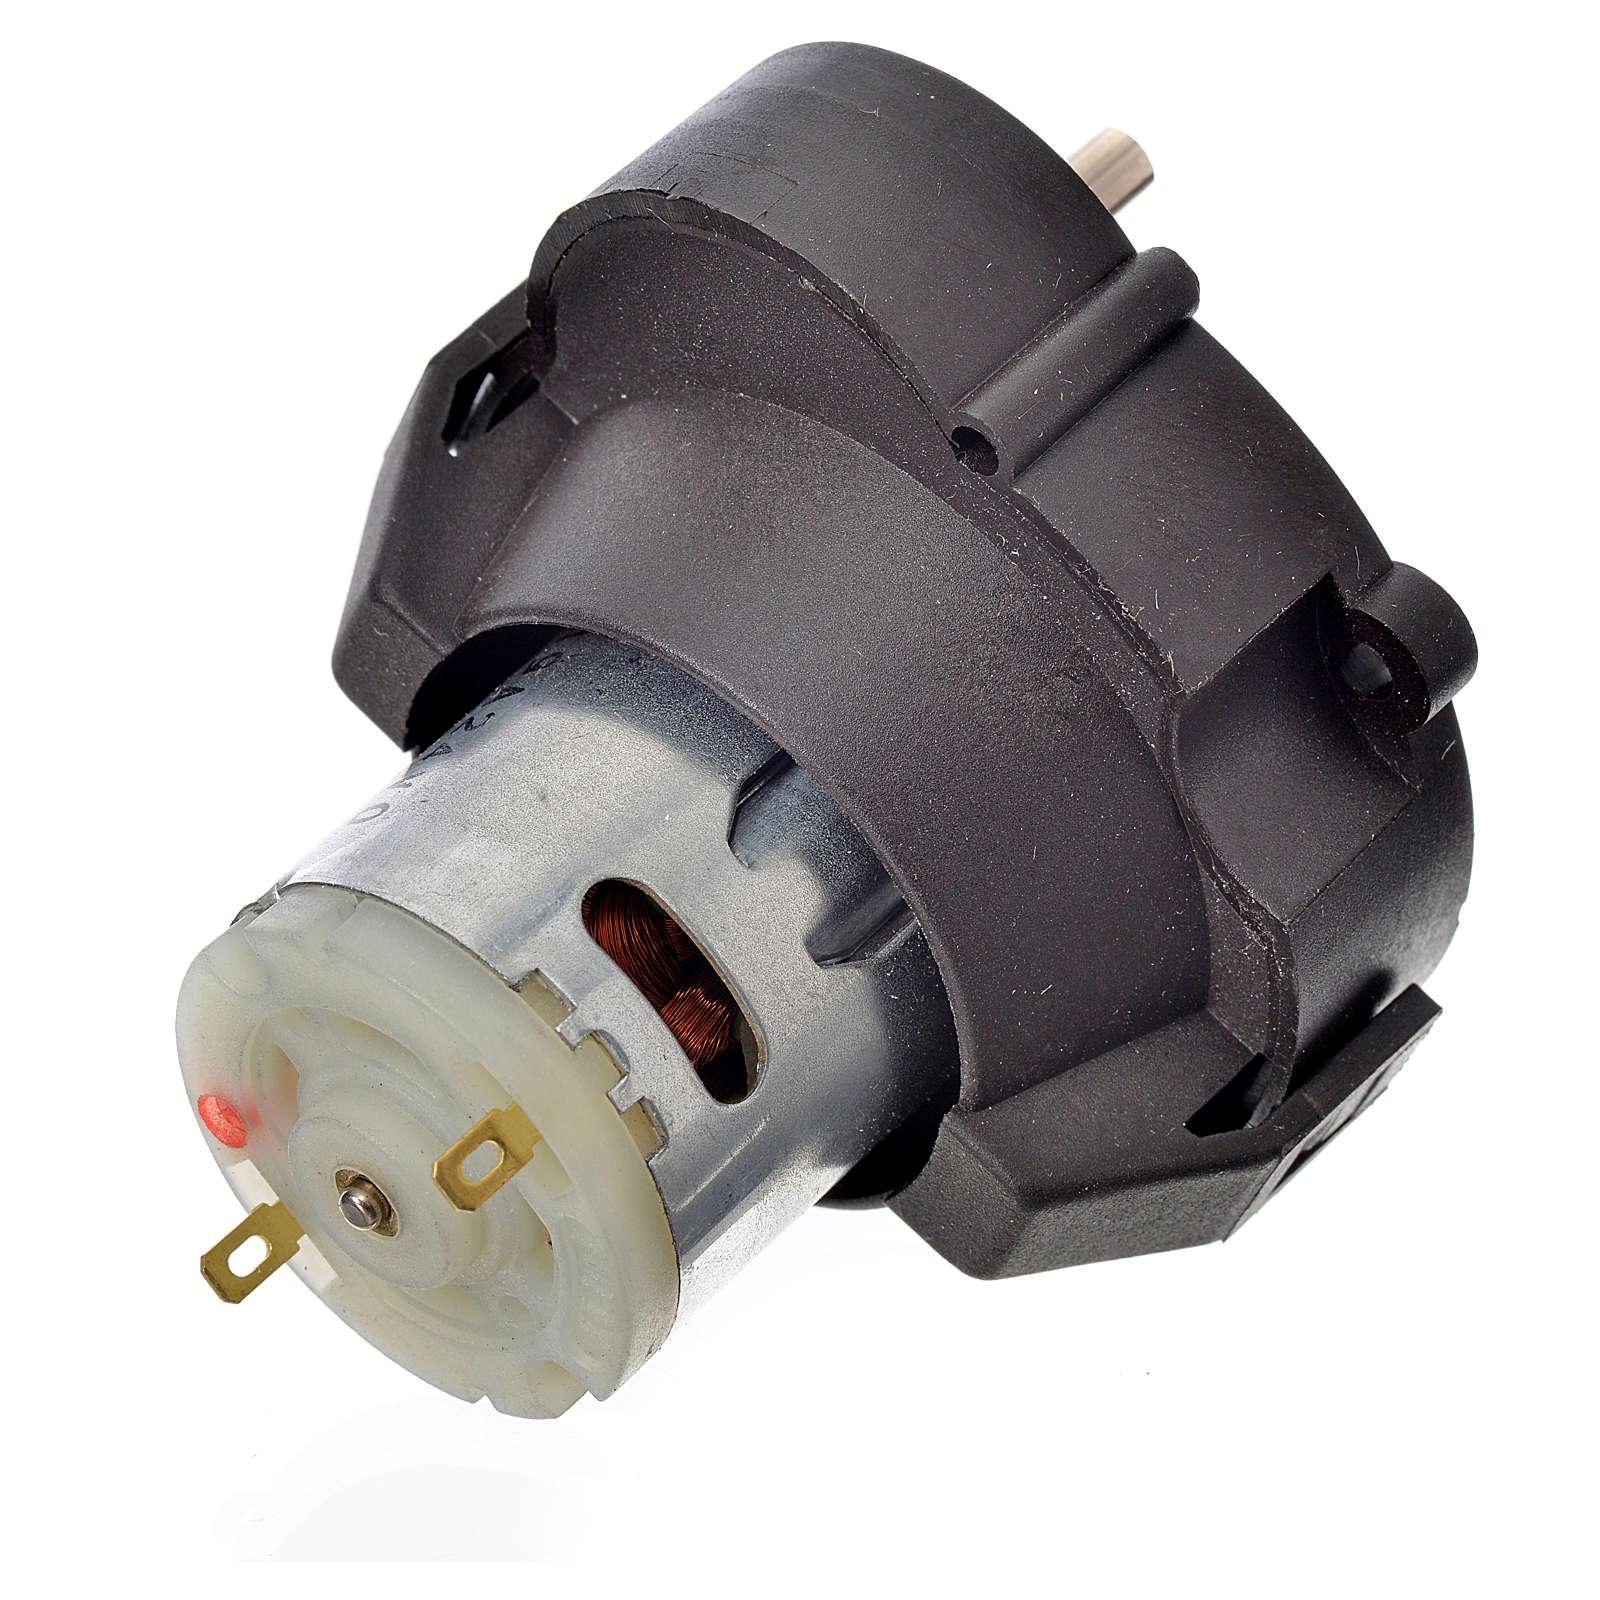 Nativity accessory, MCC gear motor, direct current 12V 1-3t/m 4